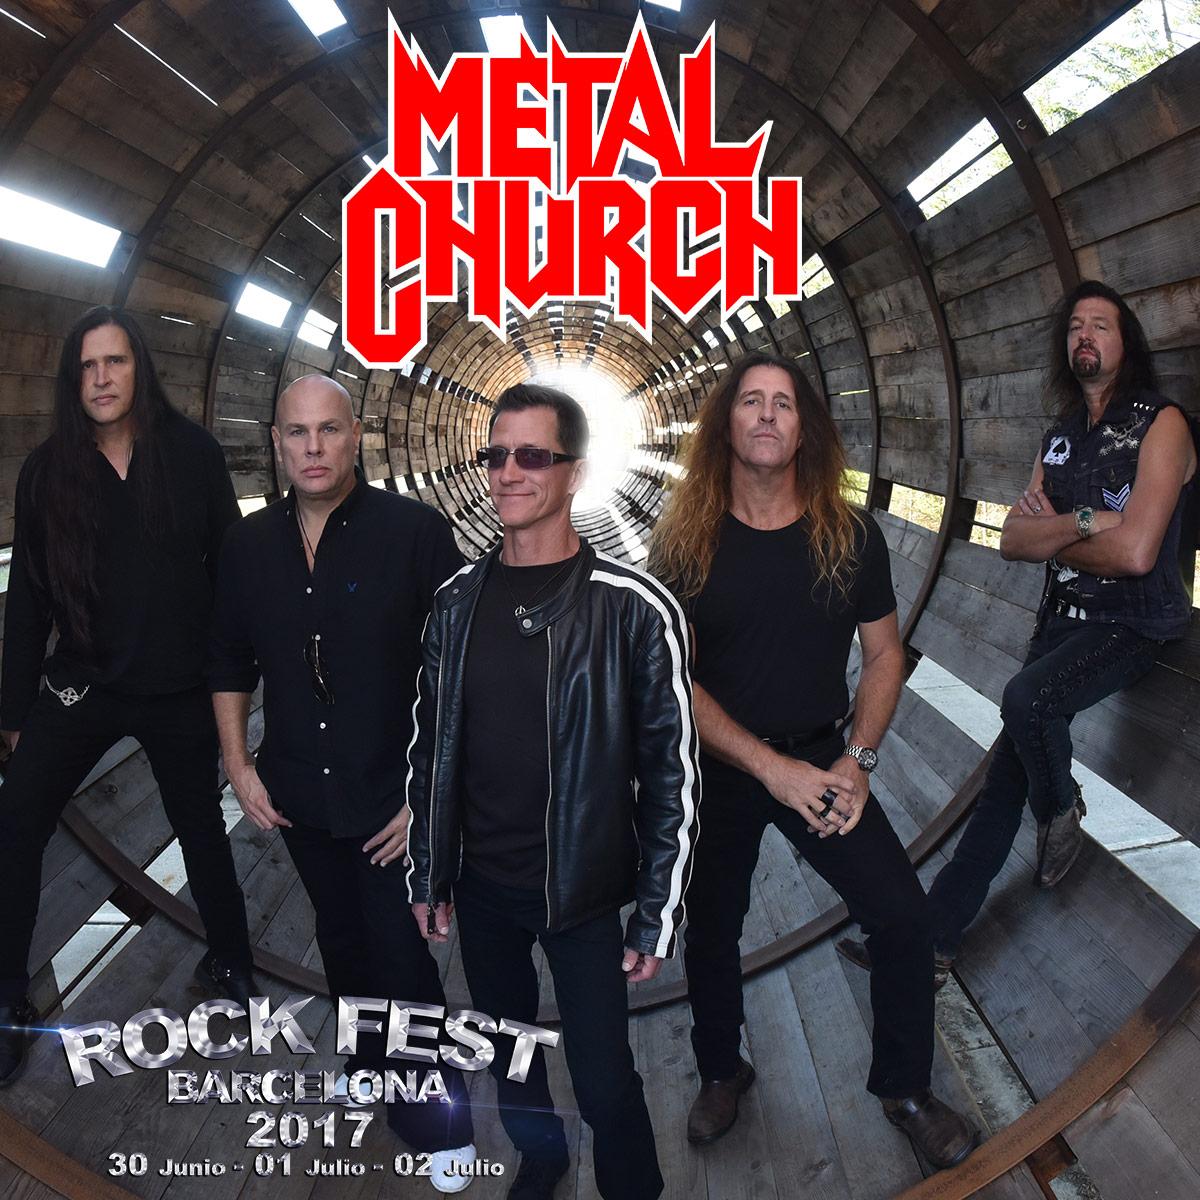 Metal_church